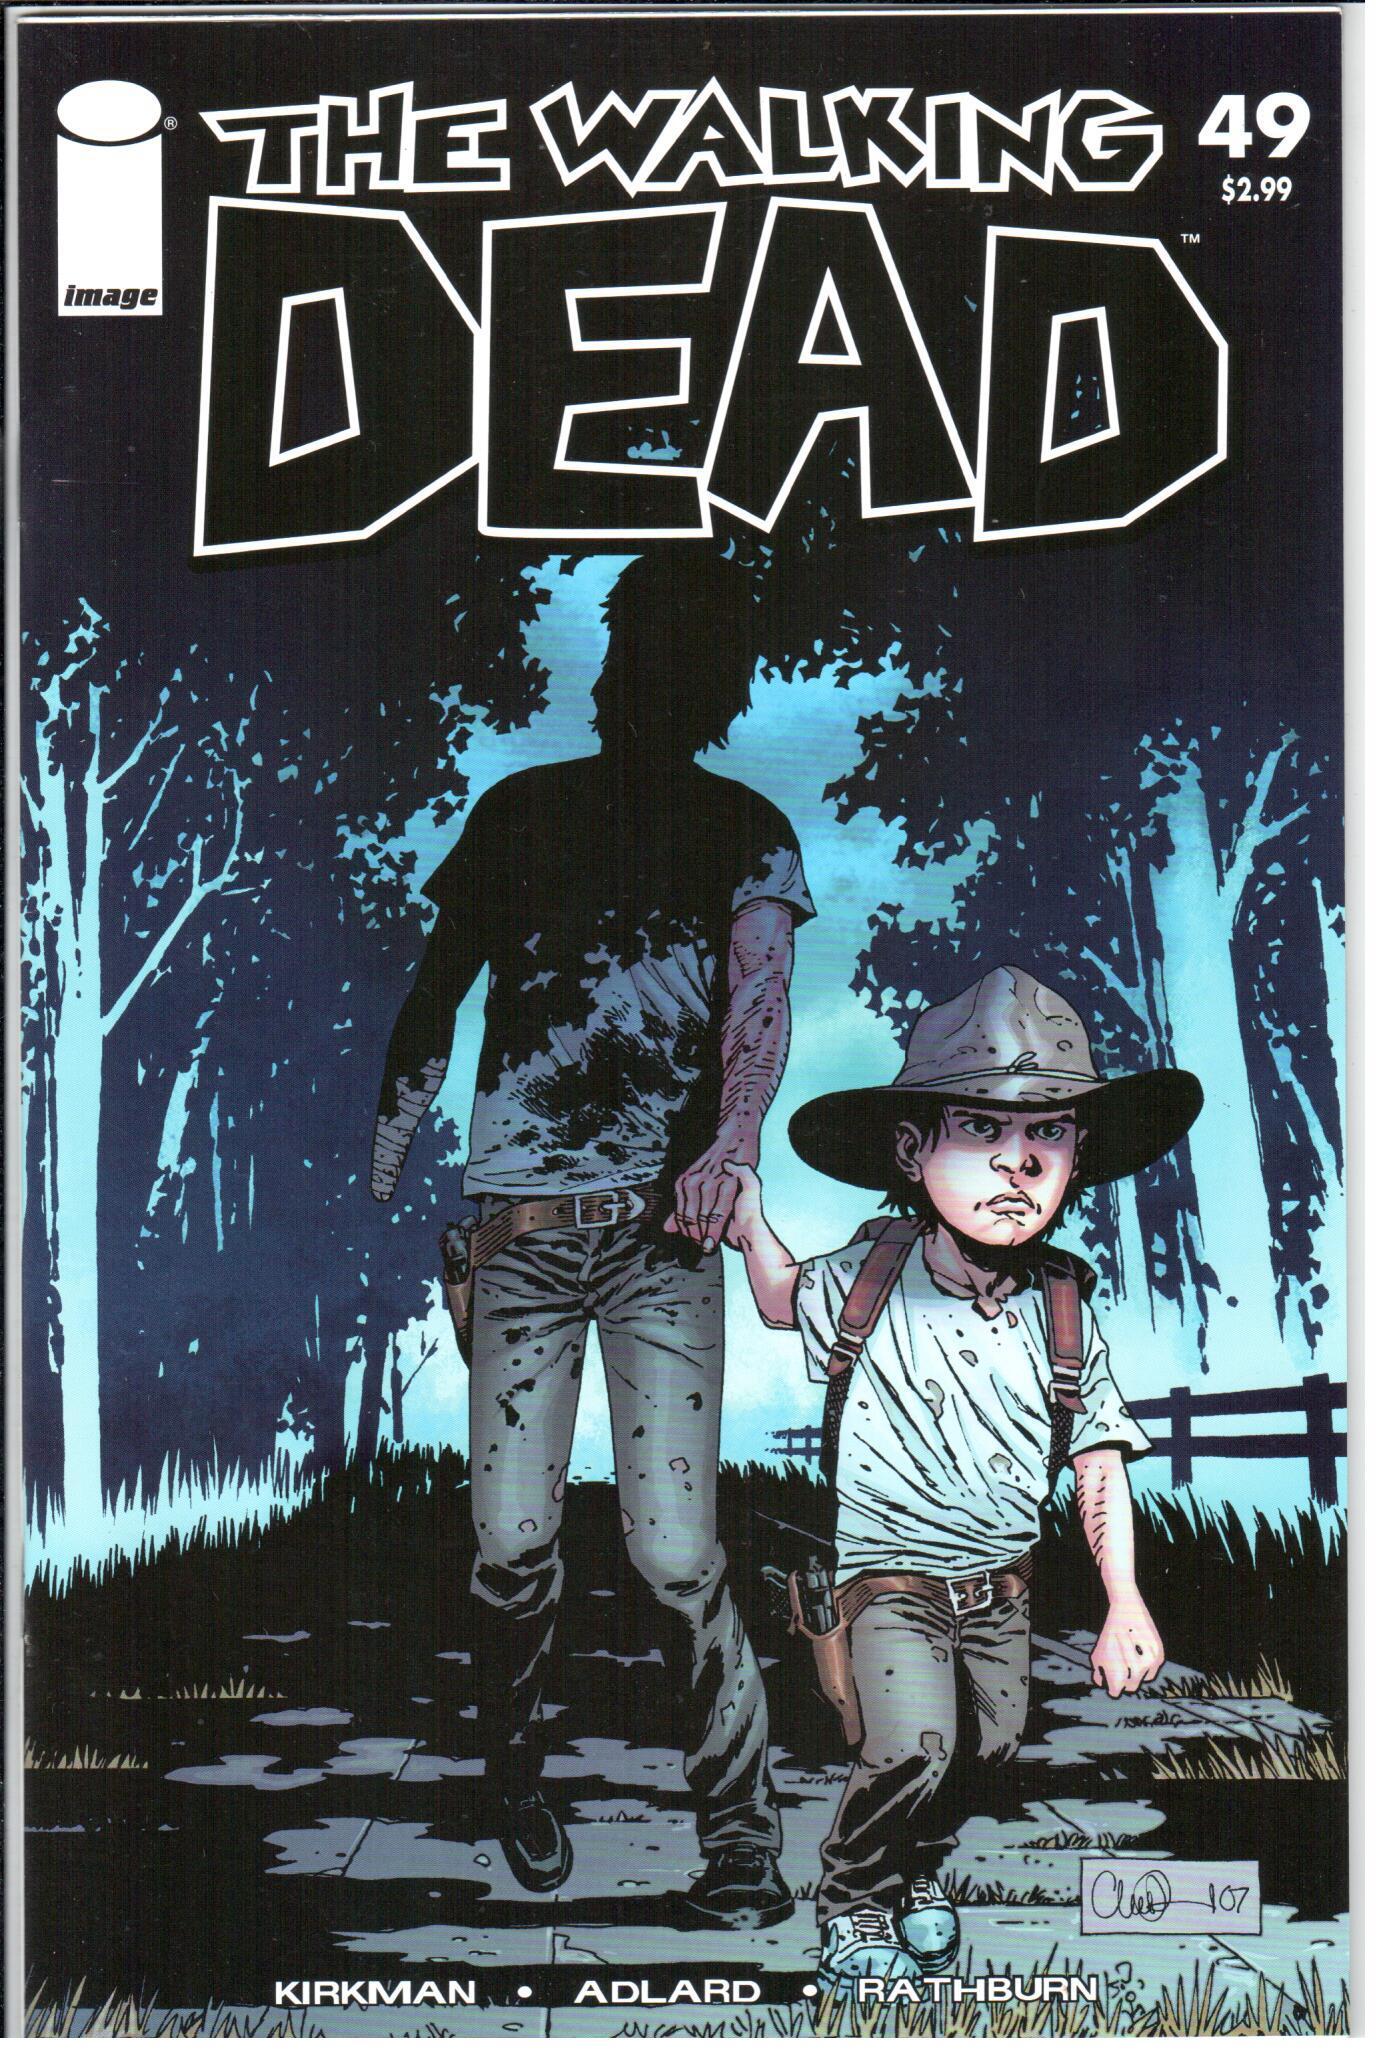 Walking Dead Series 49 1st Print May Image Nm